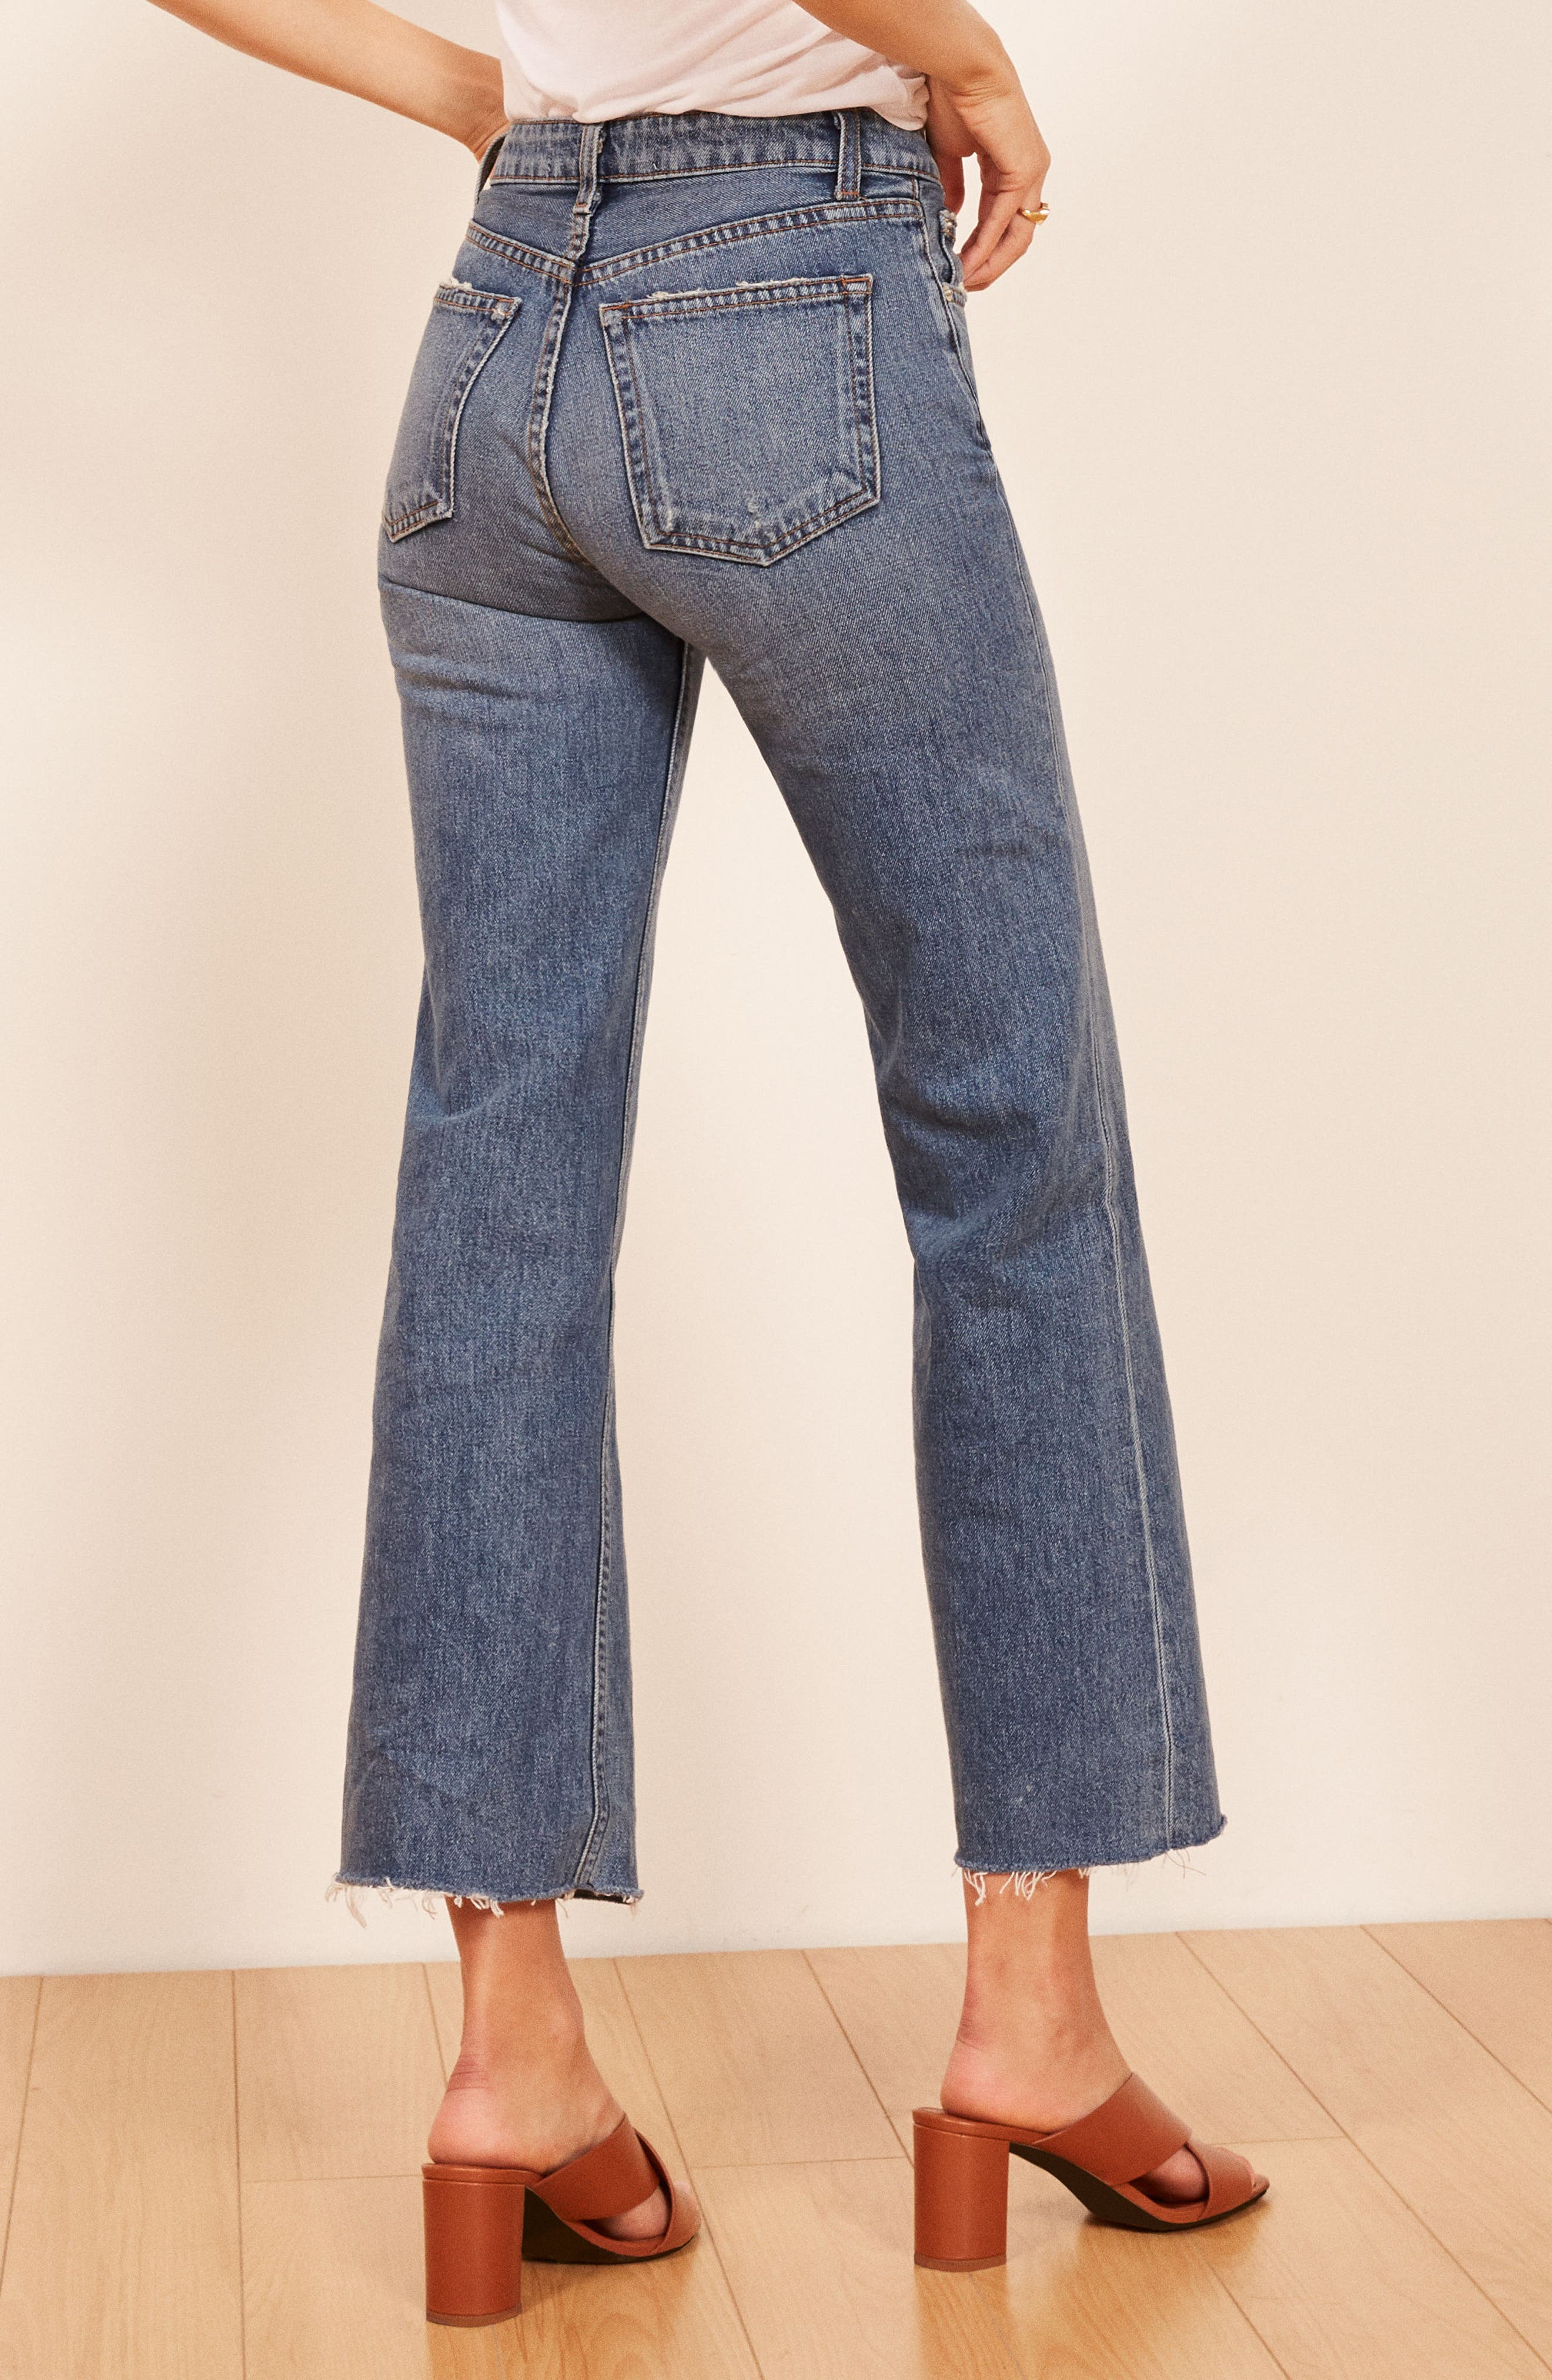 REFORMATION, Fawcett High Waist Crop Jeans, Alternate thumbnail 2, color, CELTIC